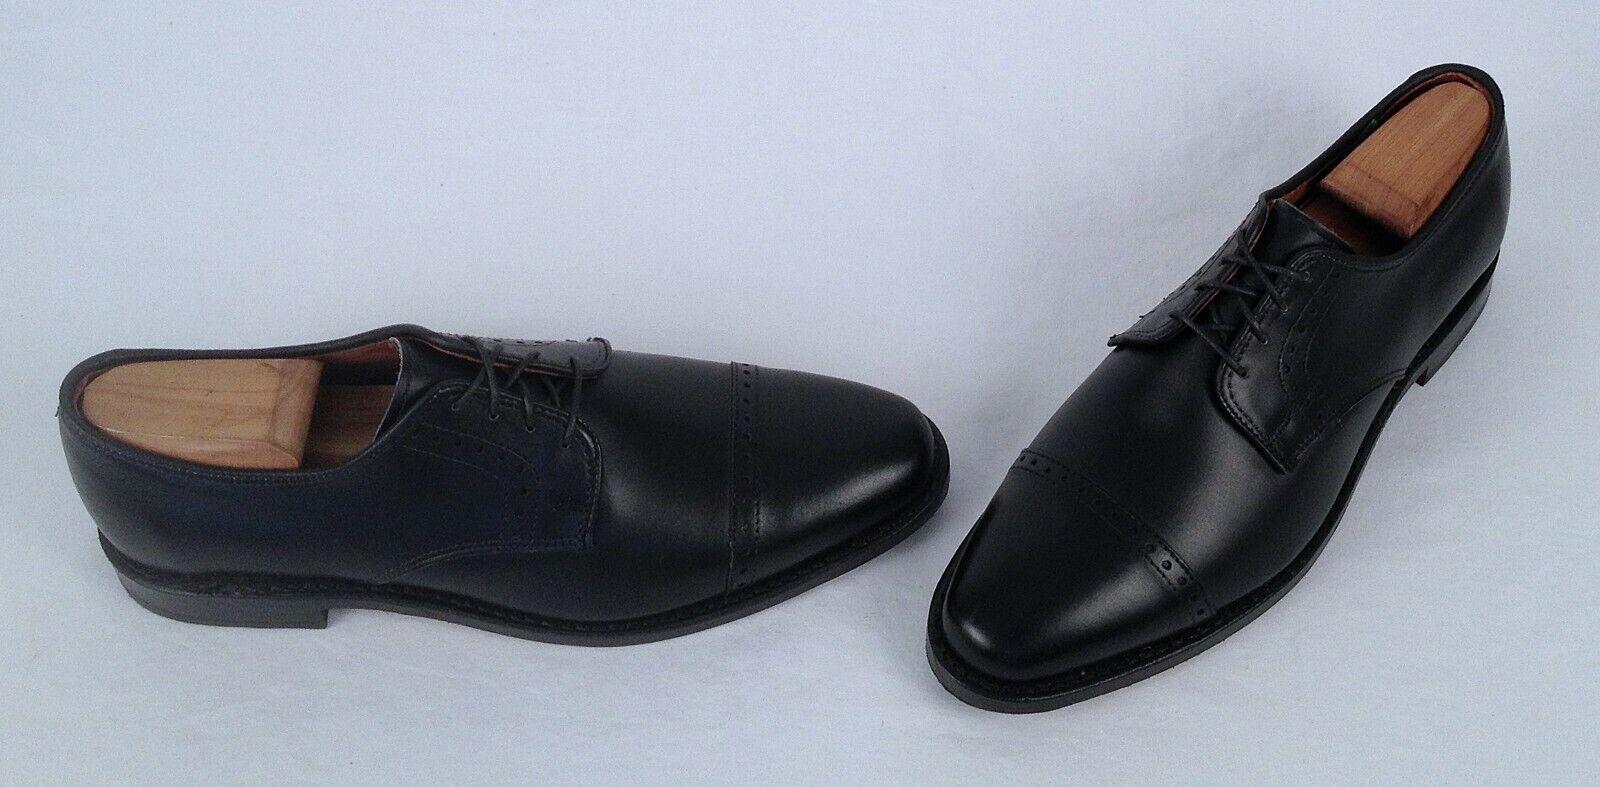 NEW   Allen Edmonds 'Clifton' Oxford - Black Calf - Size 8 D  350